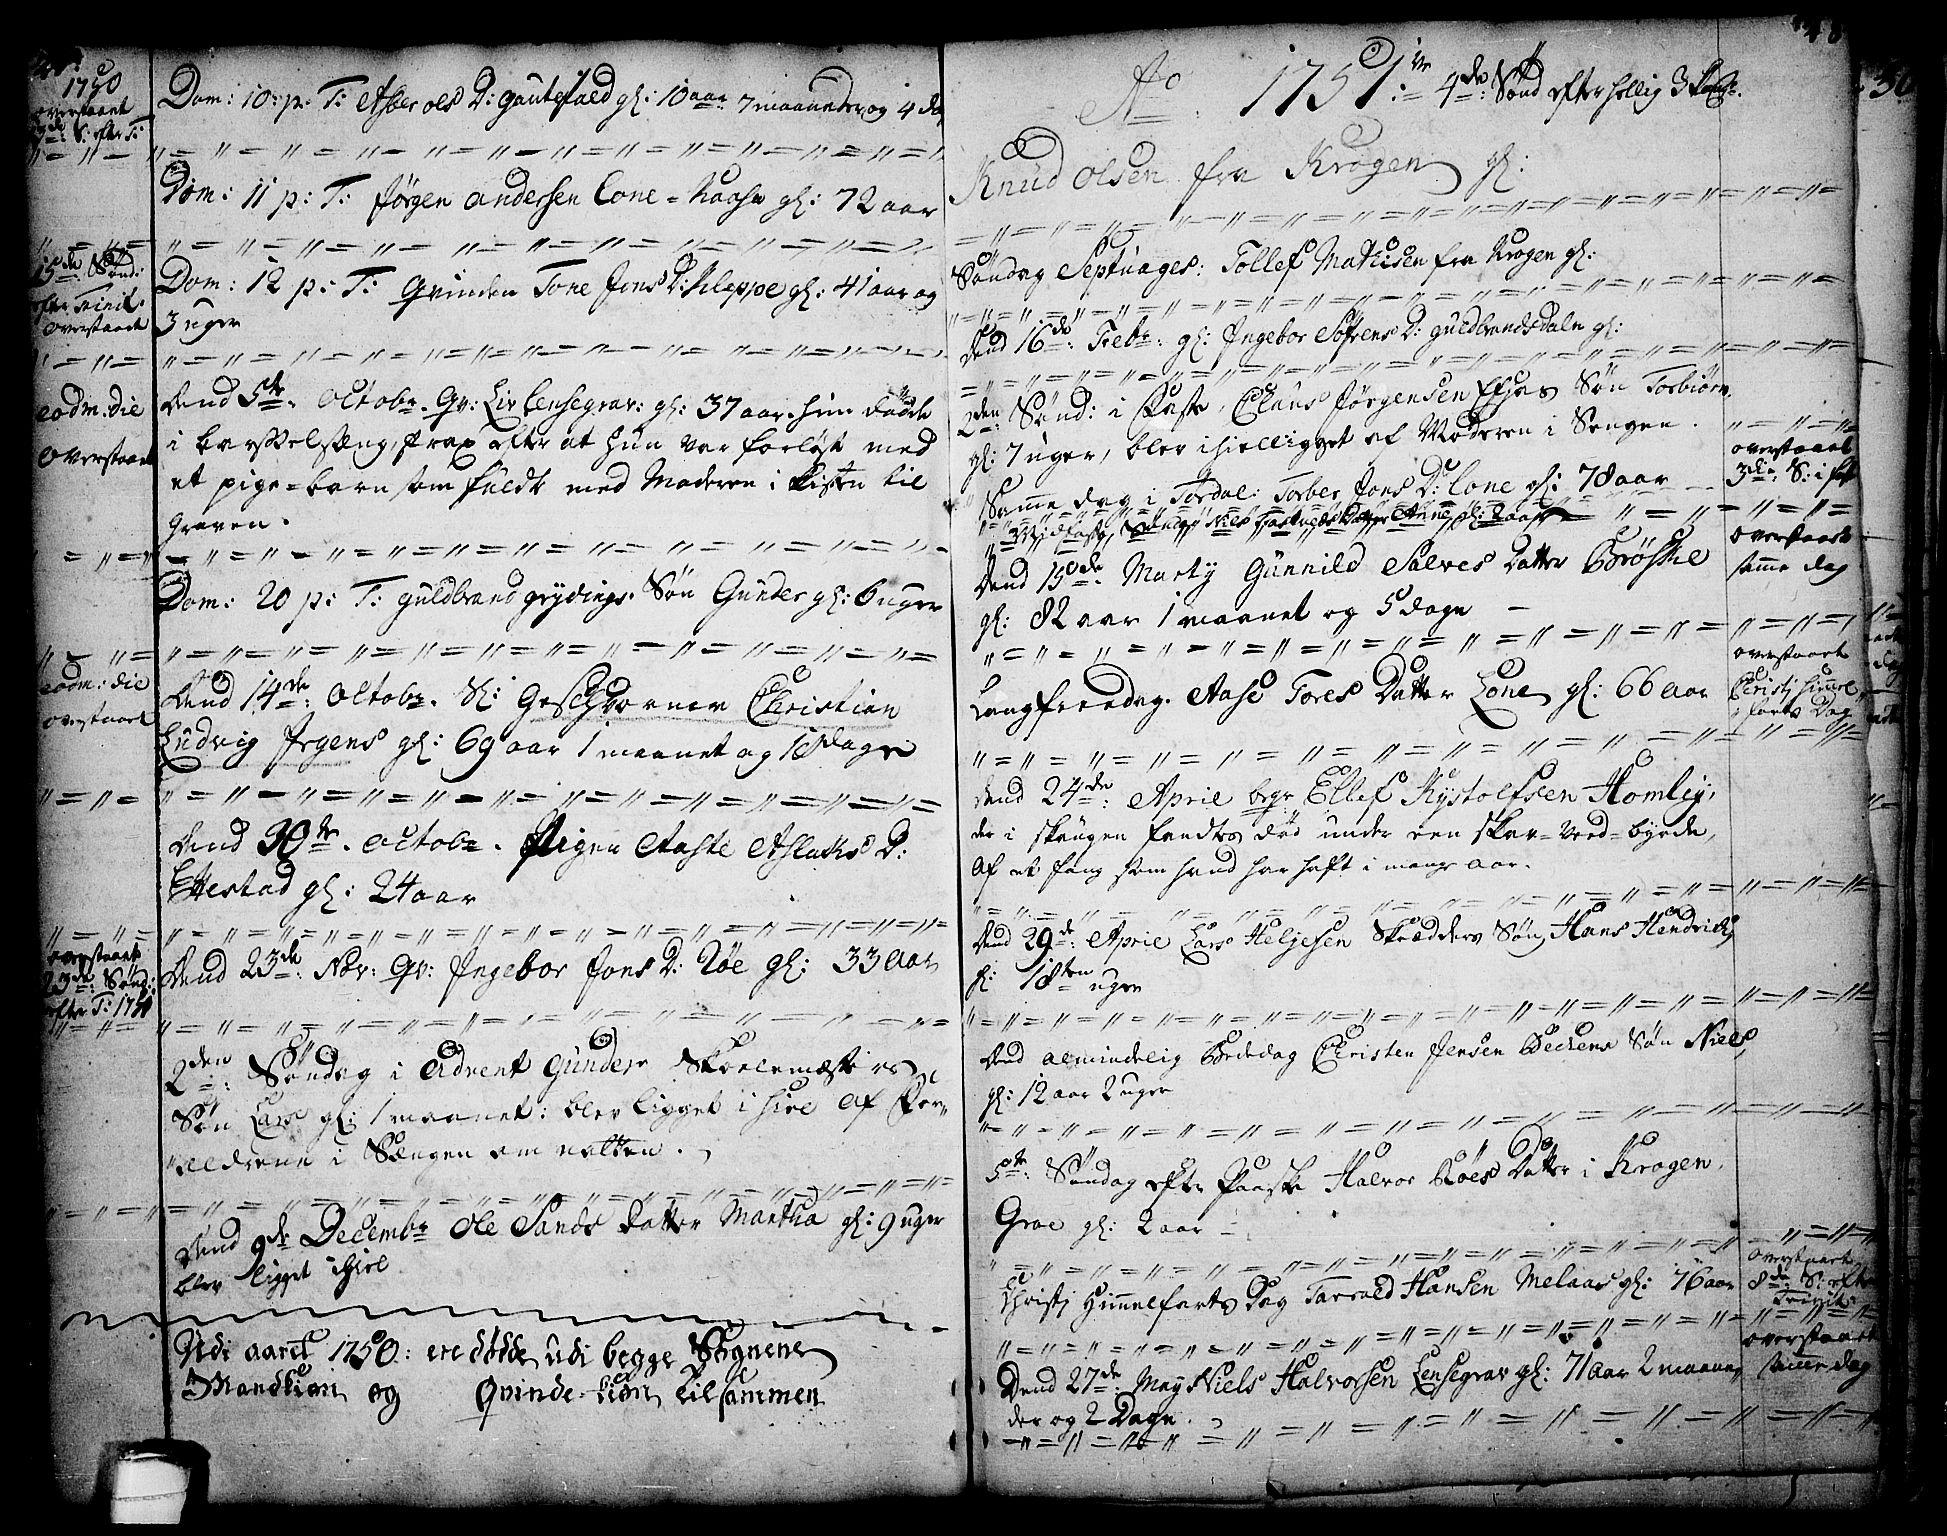 SAKO, Drangedal kirkebøker, F/Fa/L0002: Ministerialbok nr. 2, 1733-1753, s. 27-28